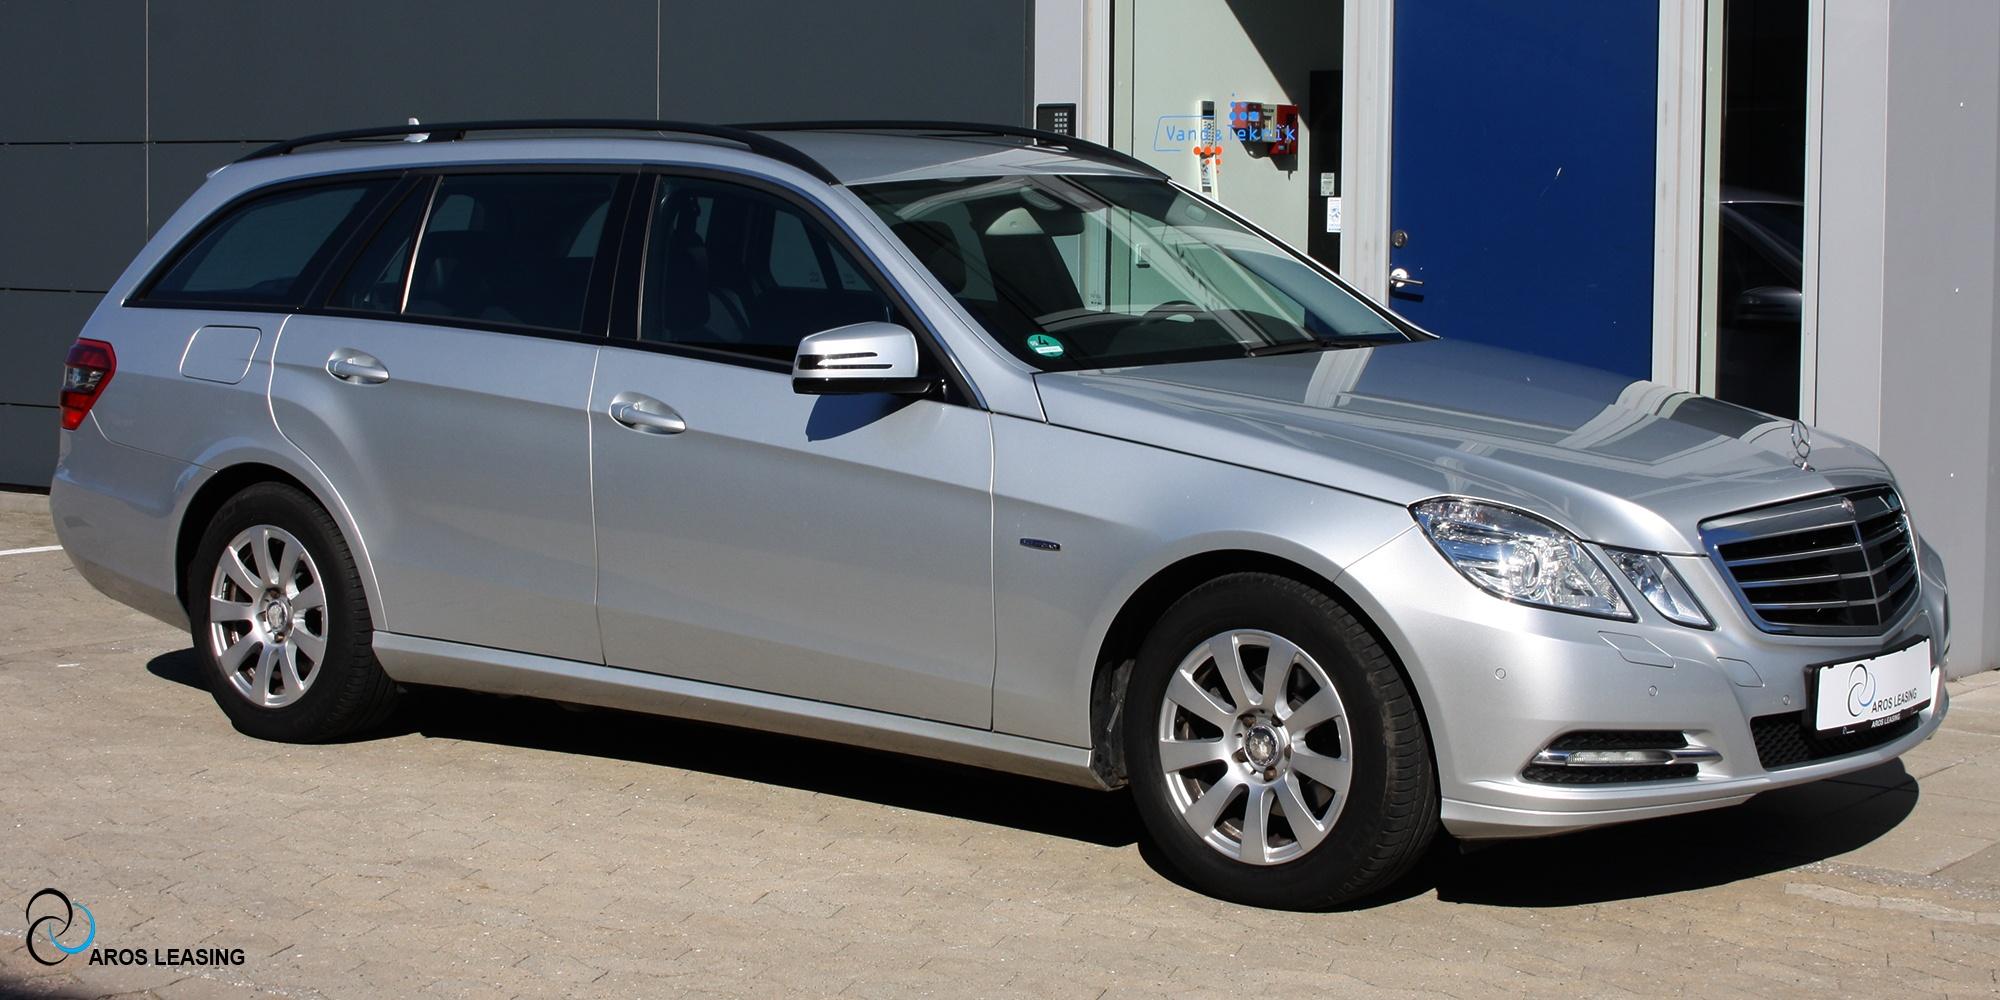 Mercedes benz e220 cdi aros leasing for Mercedes benz leasing